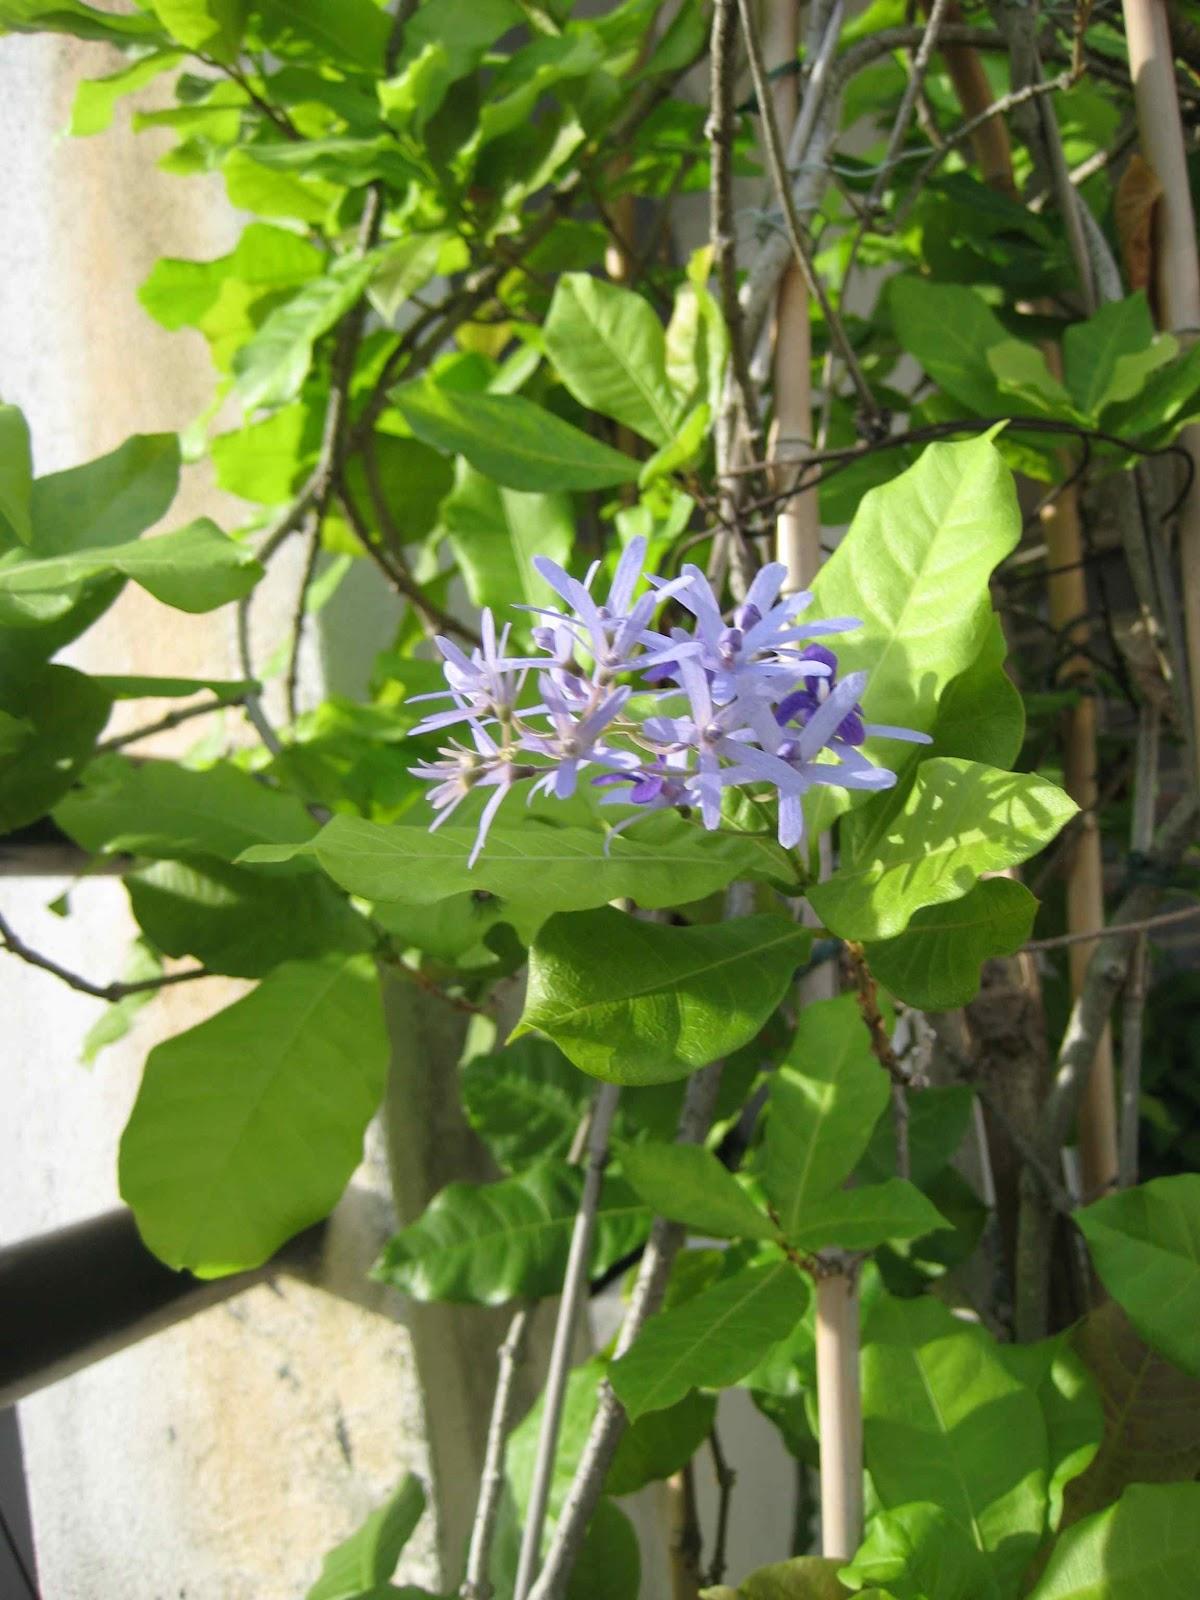 Stephs Green Space My Green Stories My Garden Finally Finally